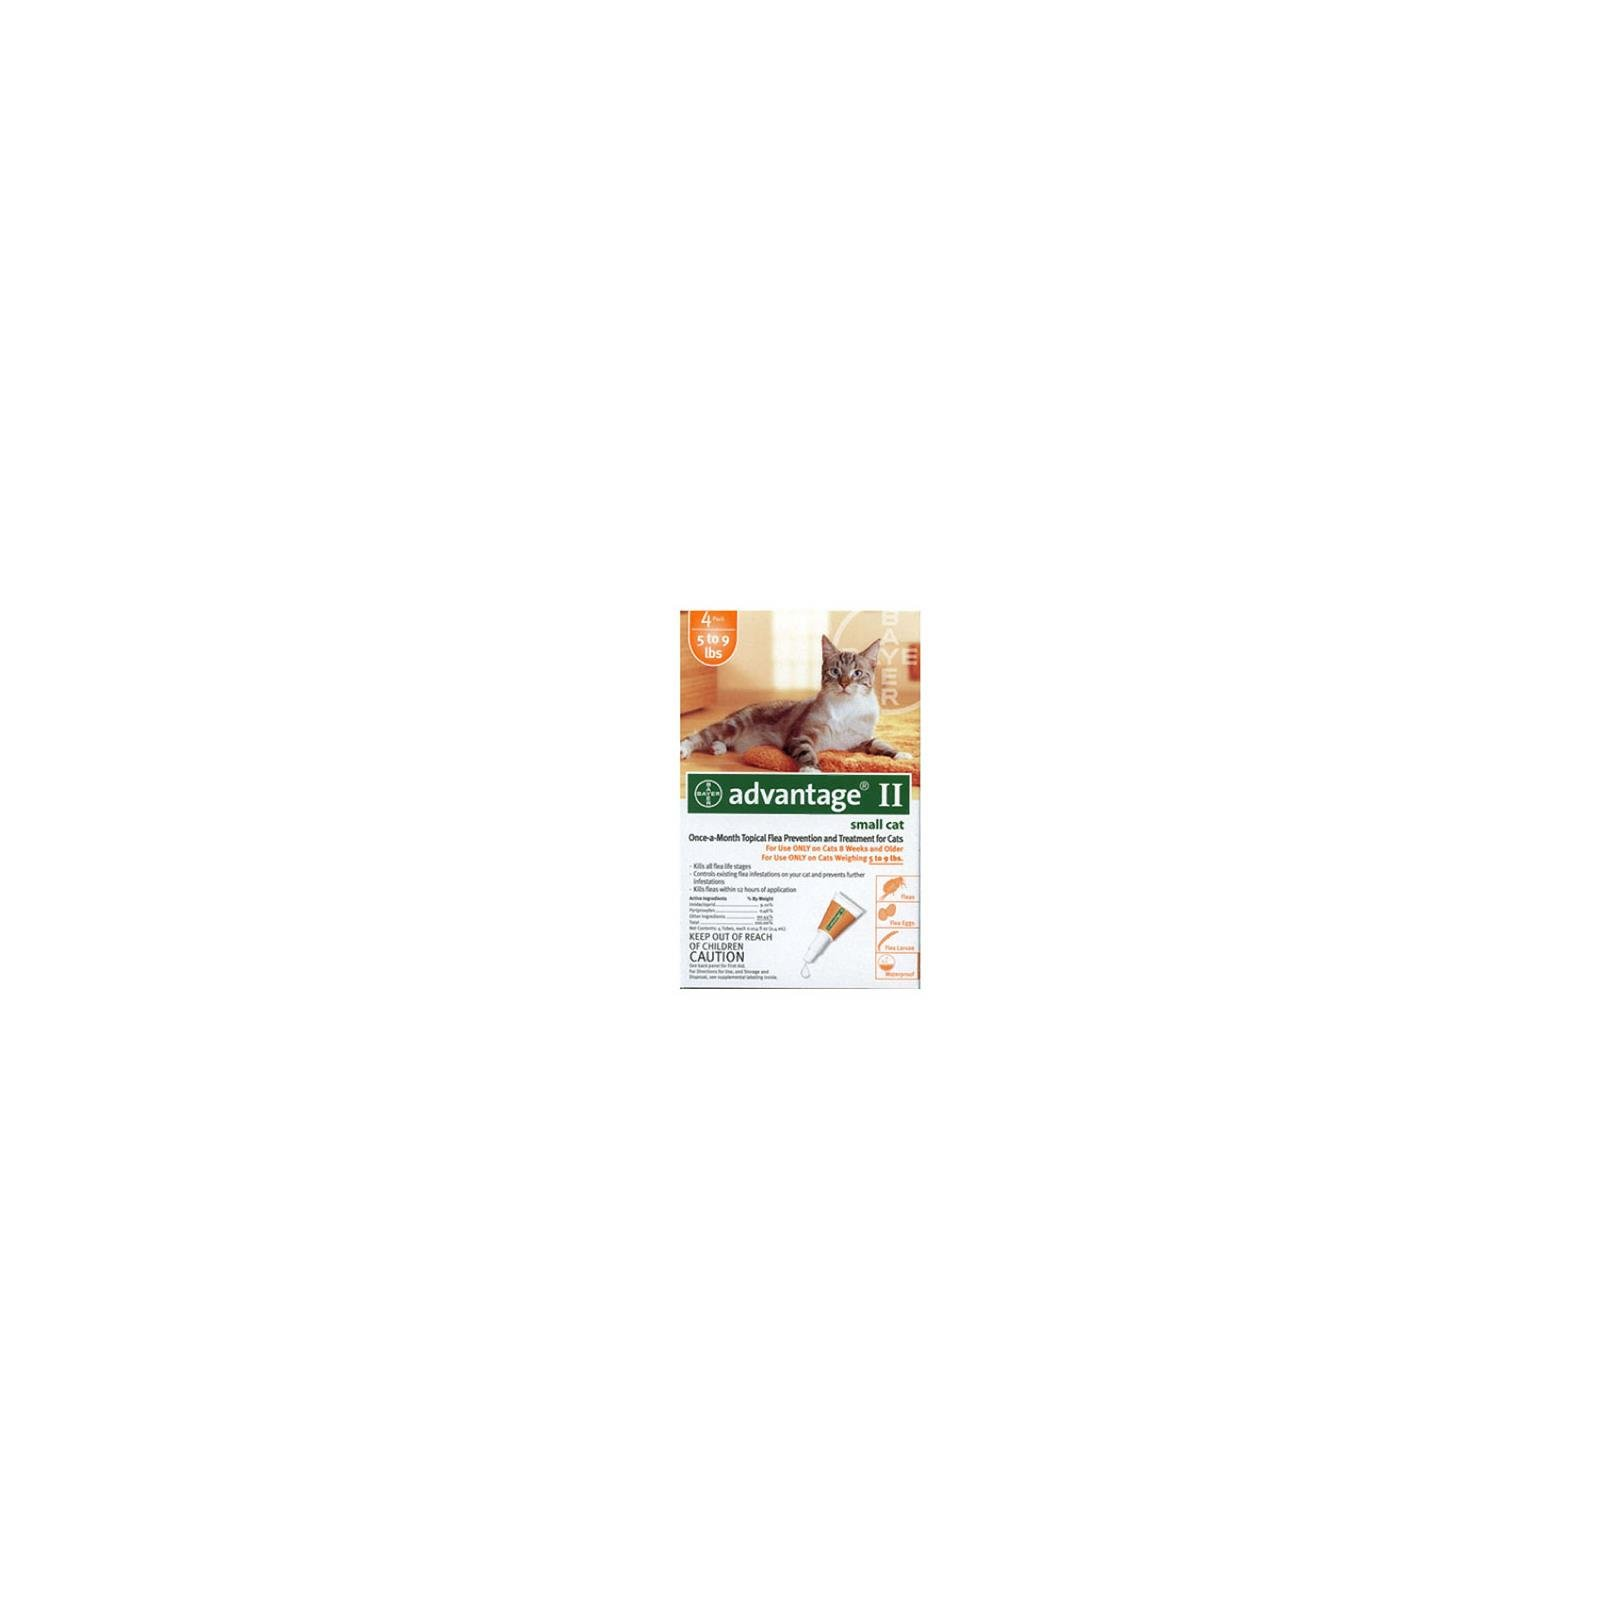 Premium Pet Products 04461669 Advantage II For Small Cats, Orange, 4-Pk. - Quantity 12